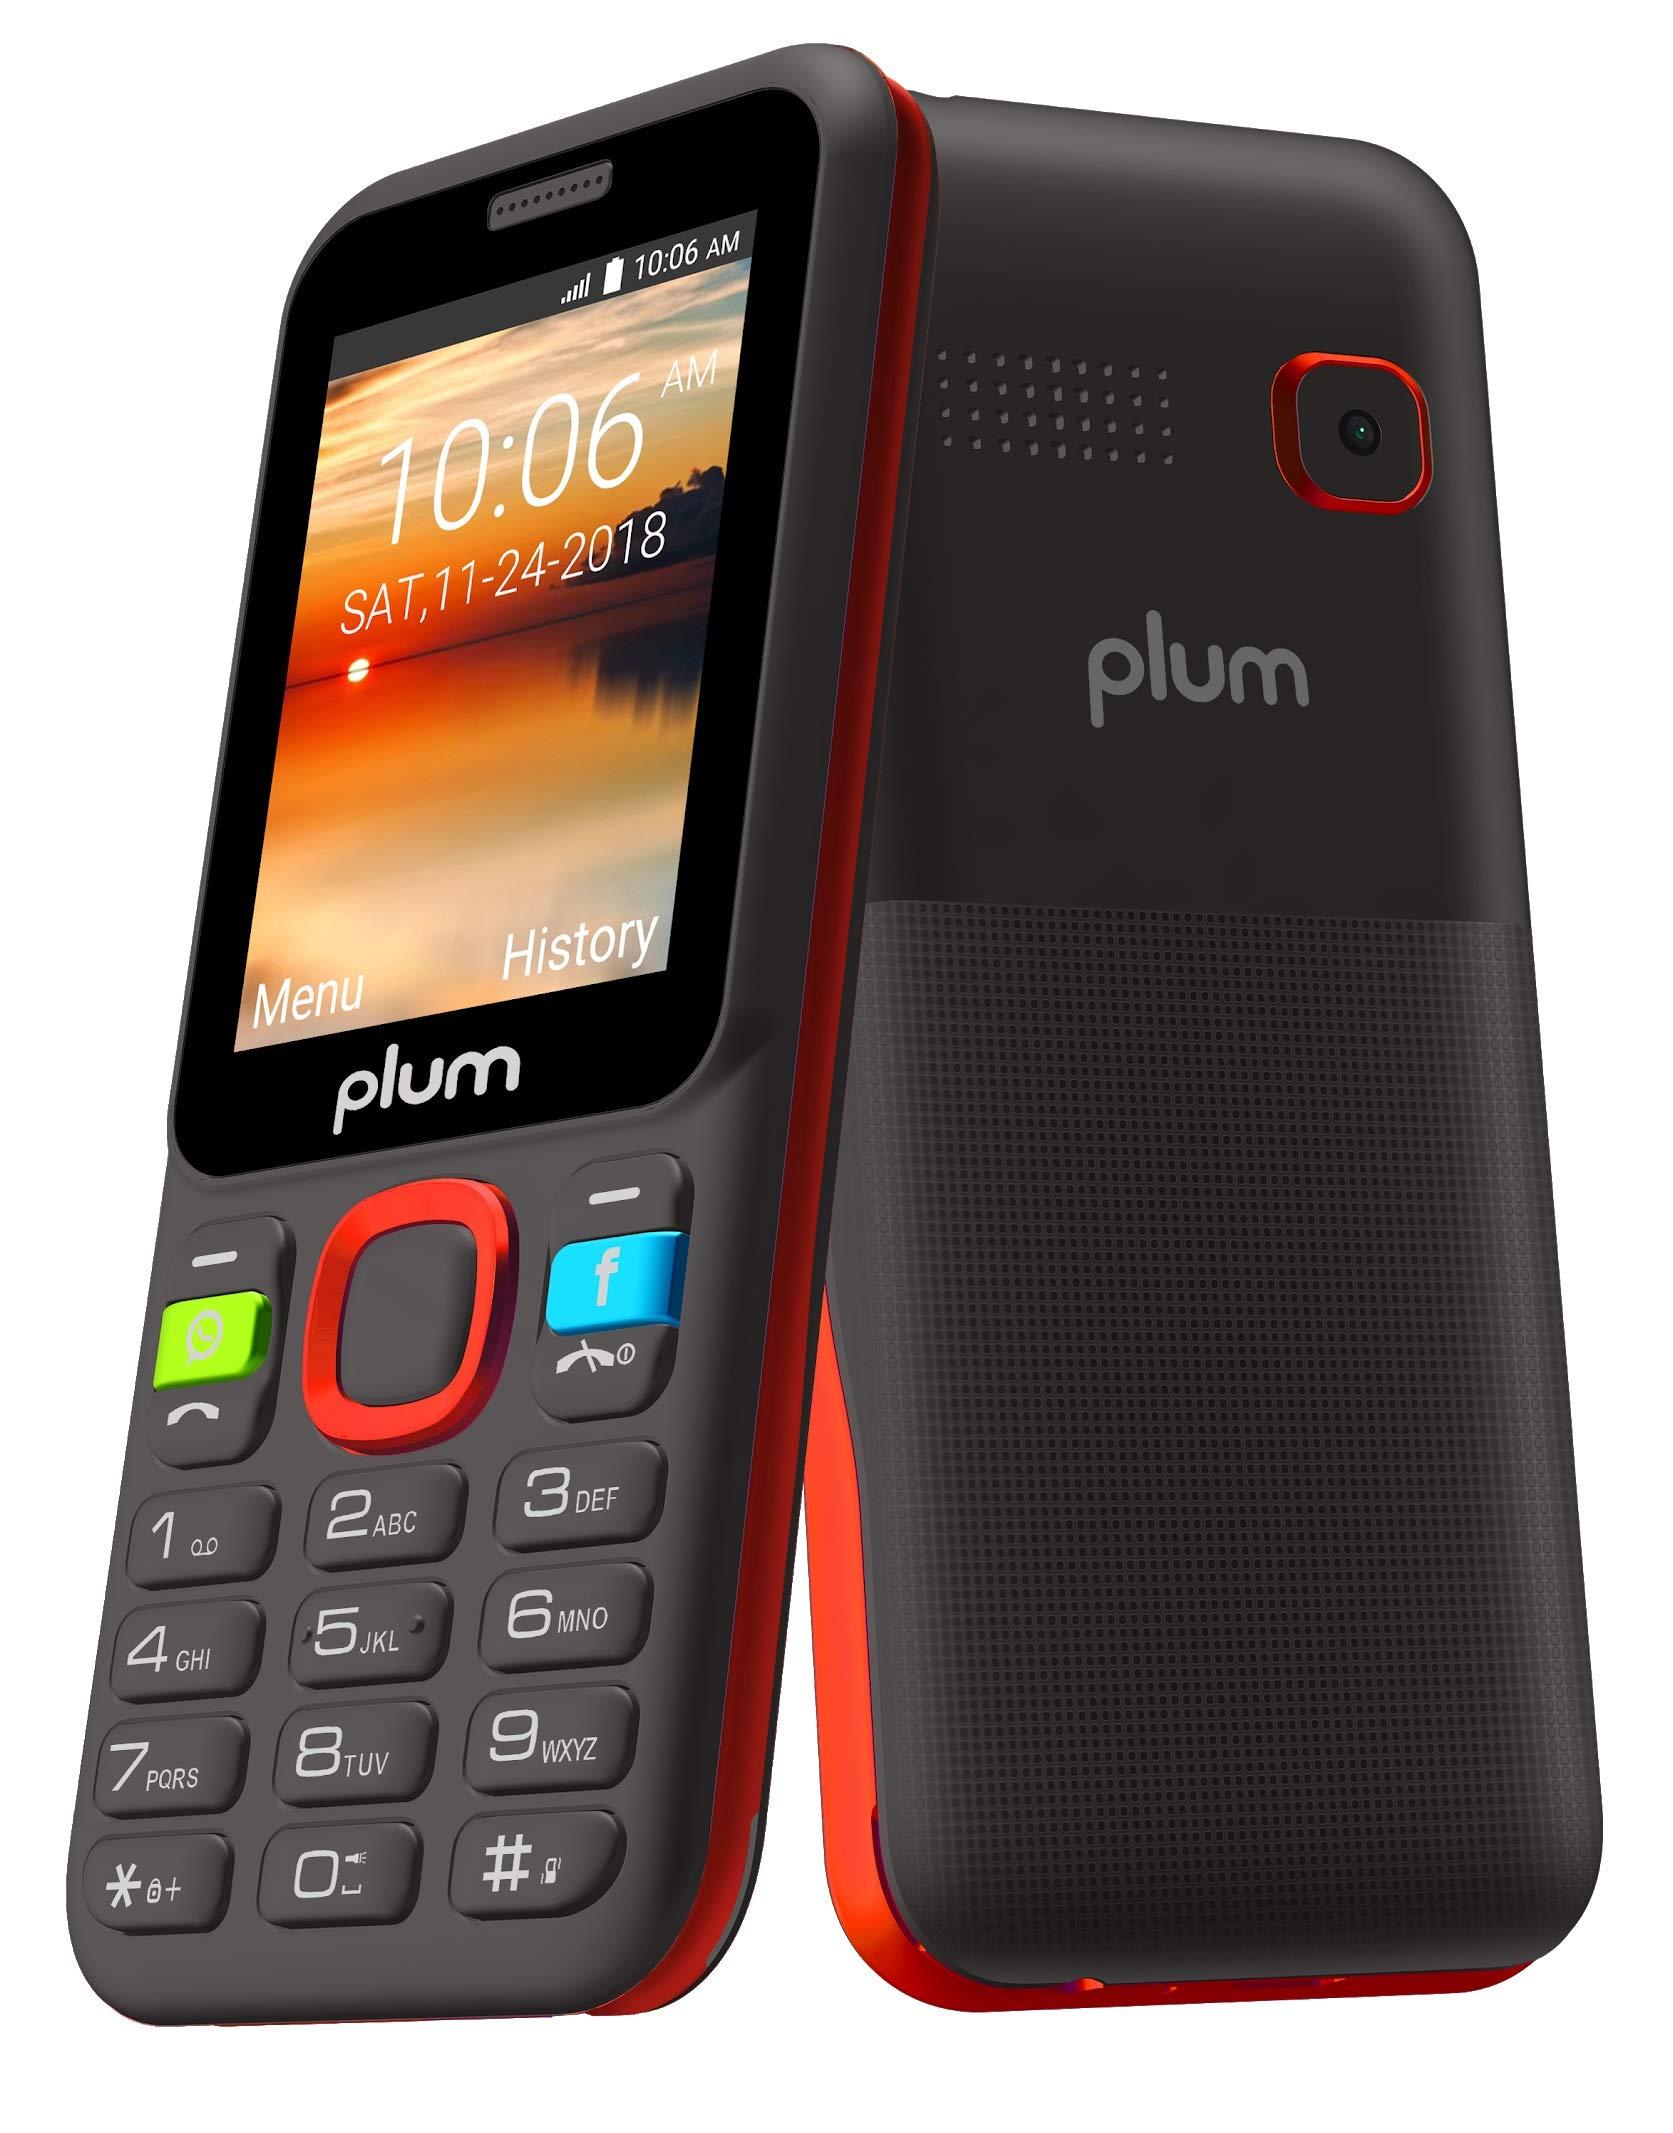 Amazon Com Plum 3g Basic Phone Gsm Unlocked Cell Phone Whatsapp Facebook Dedicated Keys Att Tmobile Metro Cricket Mint Net10 Straight Talk Walmart Mobile Red A105red